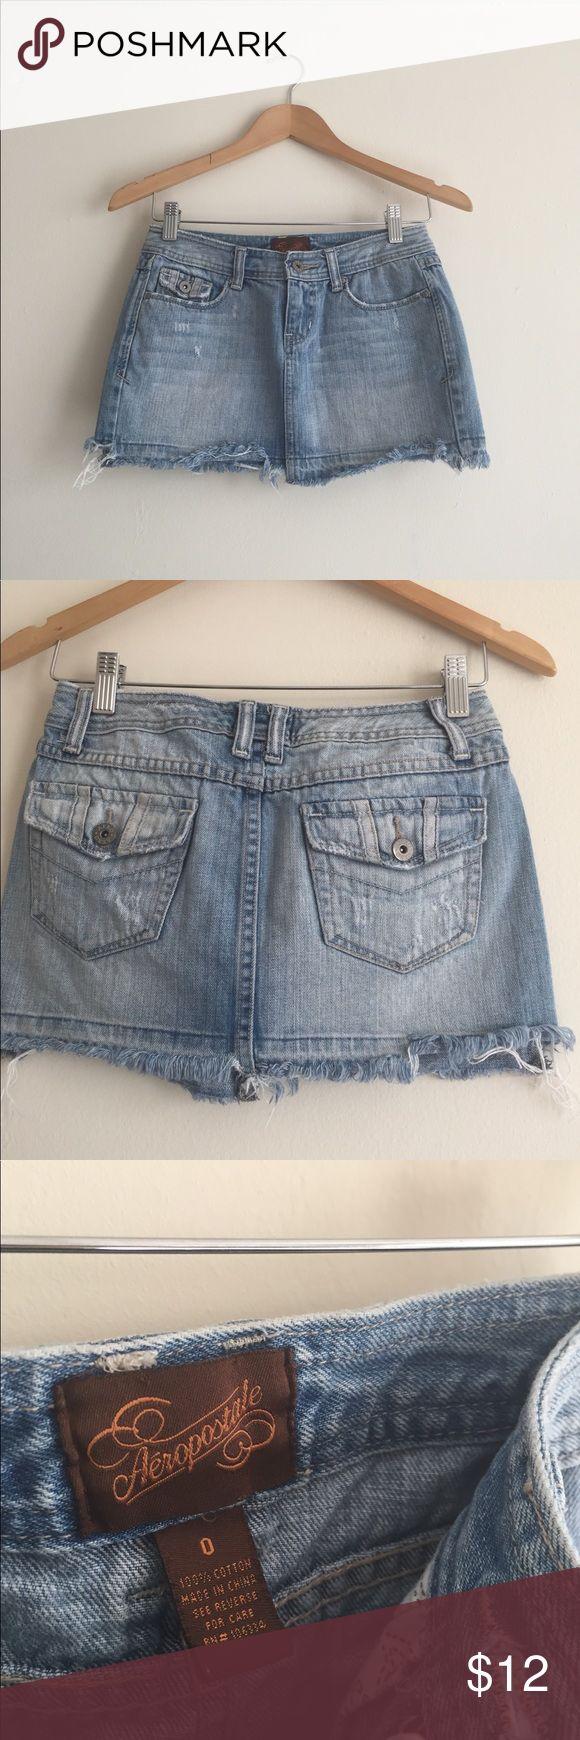 "Aeropostale distressed denim miniskirt, EUC Aeropostale distressed stonewash denim miniskirt, EUC, size 0. 11"" length, 26"" waist. Back pocket button & contrast stitch detailing, frayed hemline, 100% cotton. Aeropostale Skirts Mini"